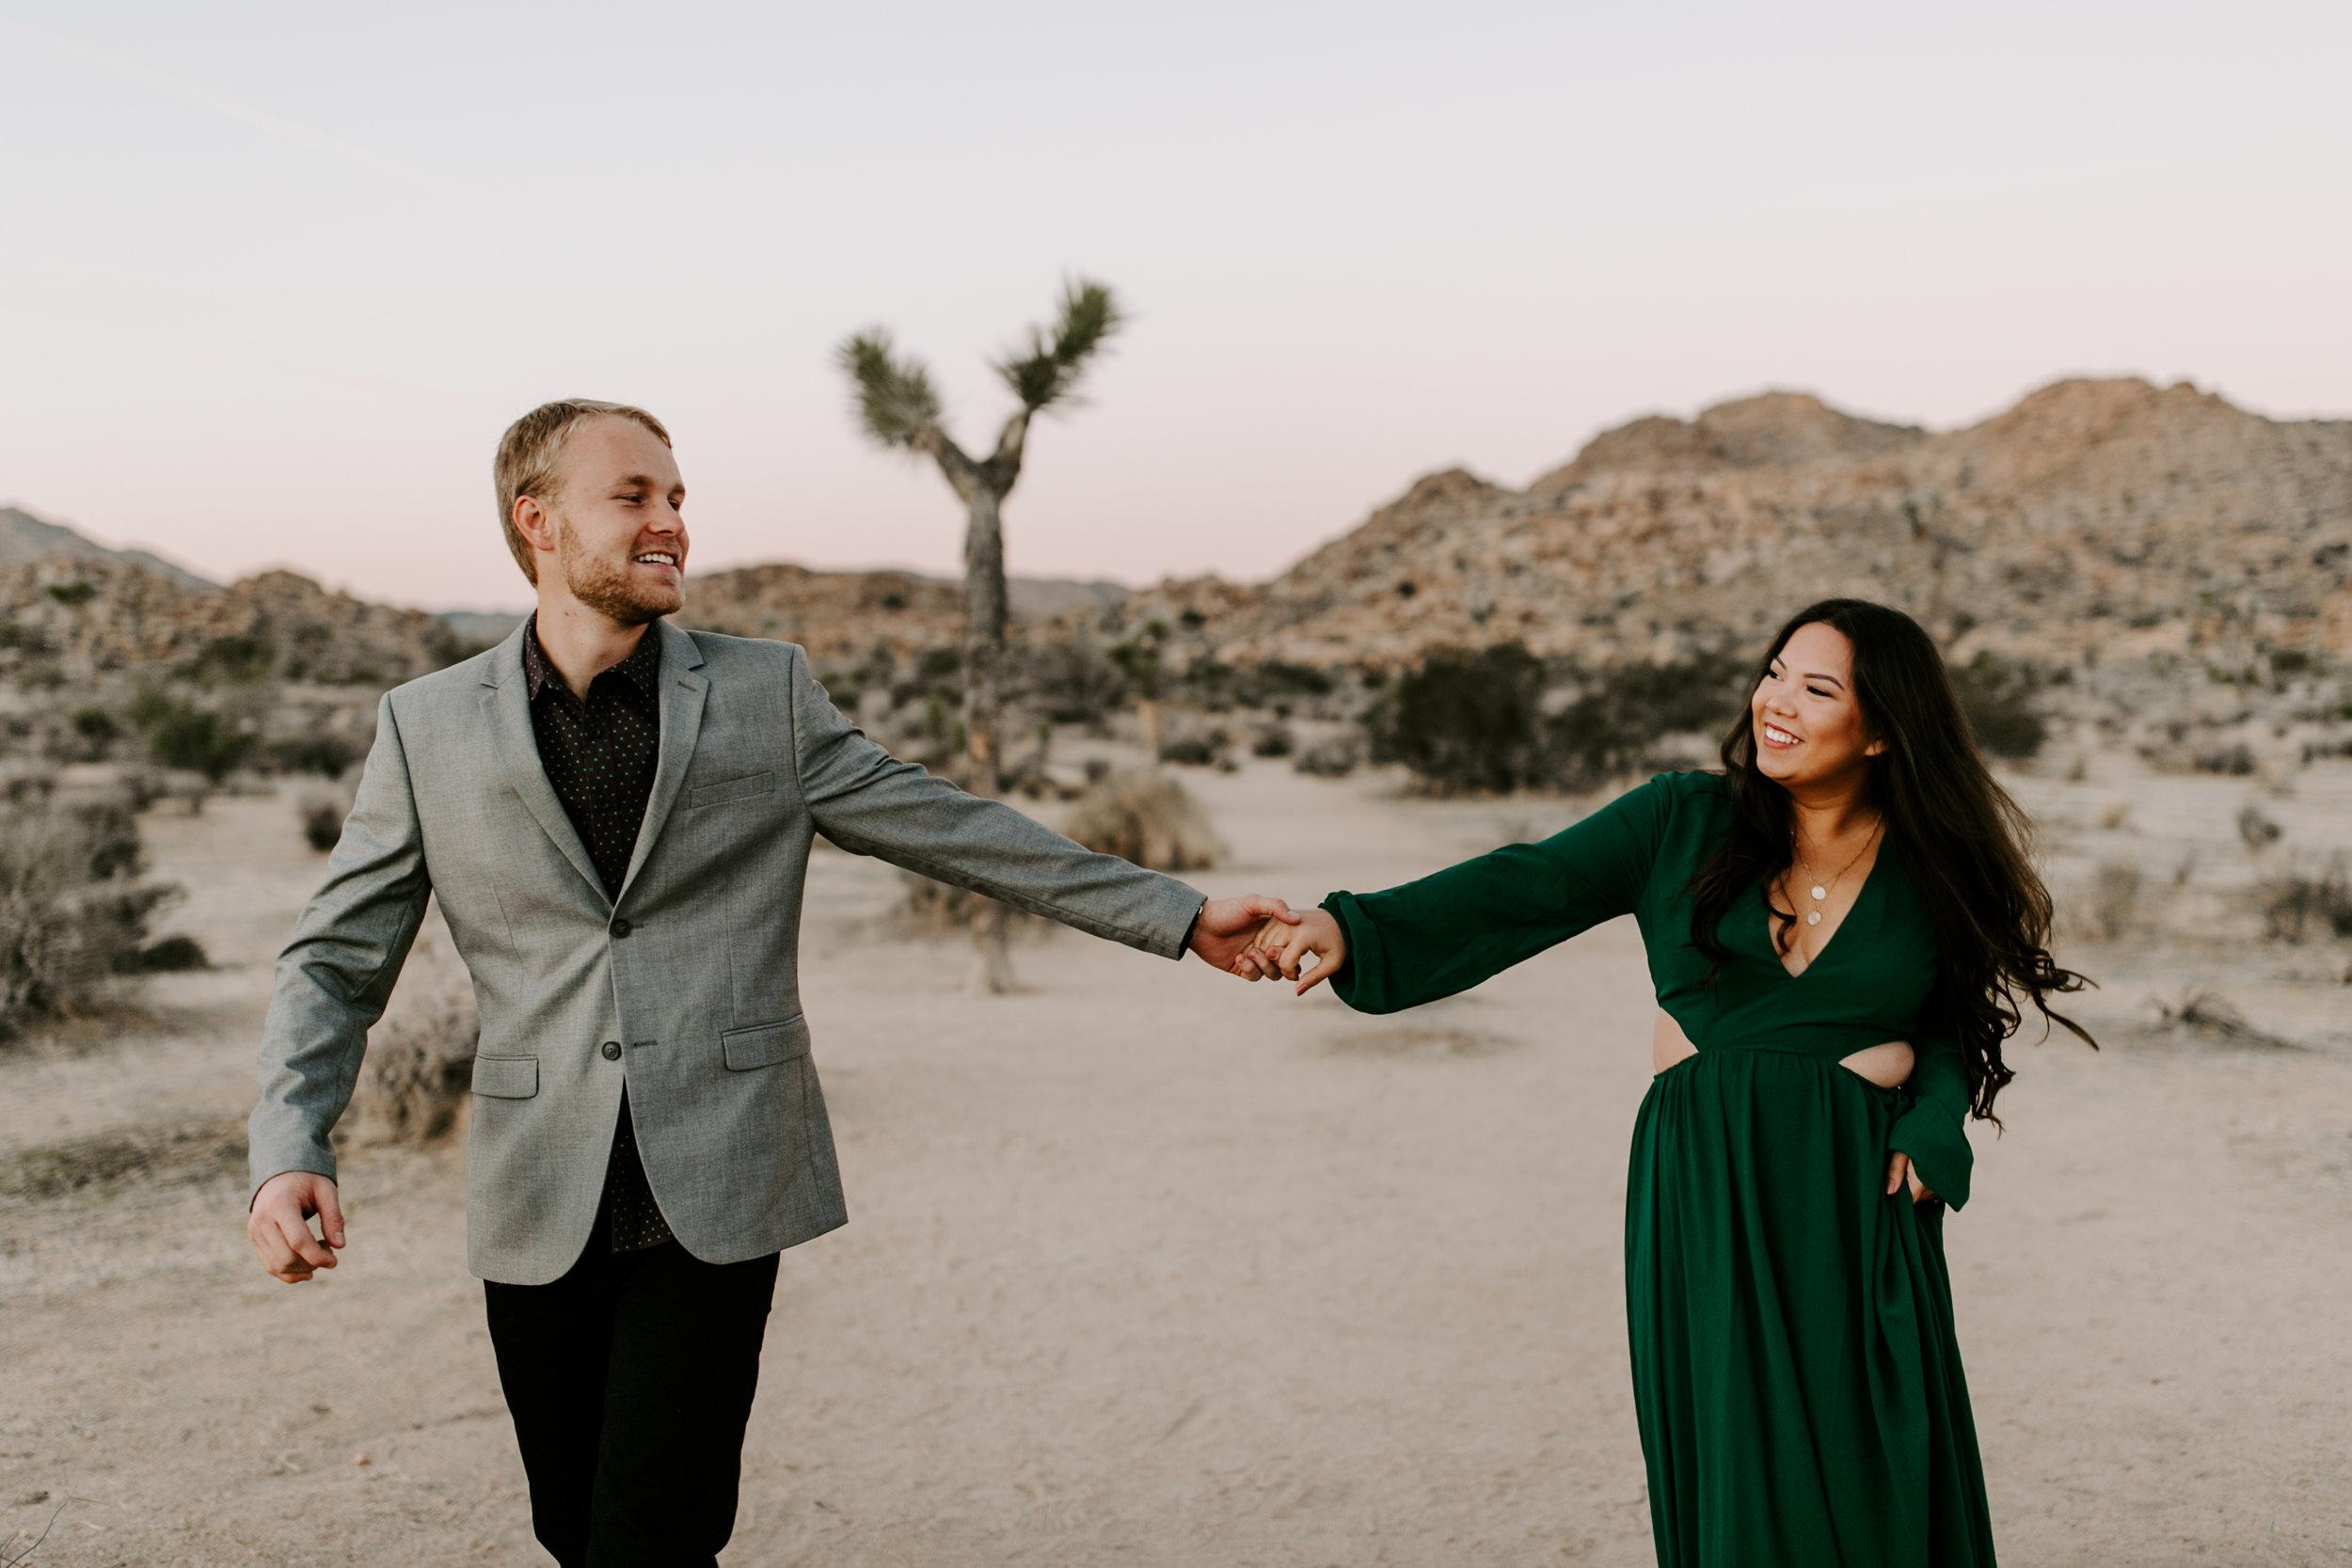 joshua-tree-elopement-photographer-california-wedding-photographer-3.jpg